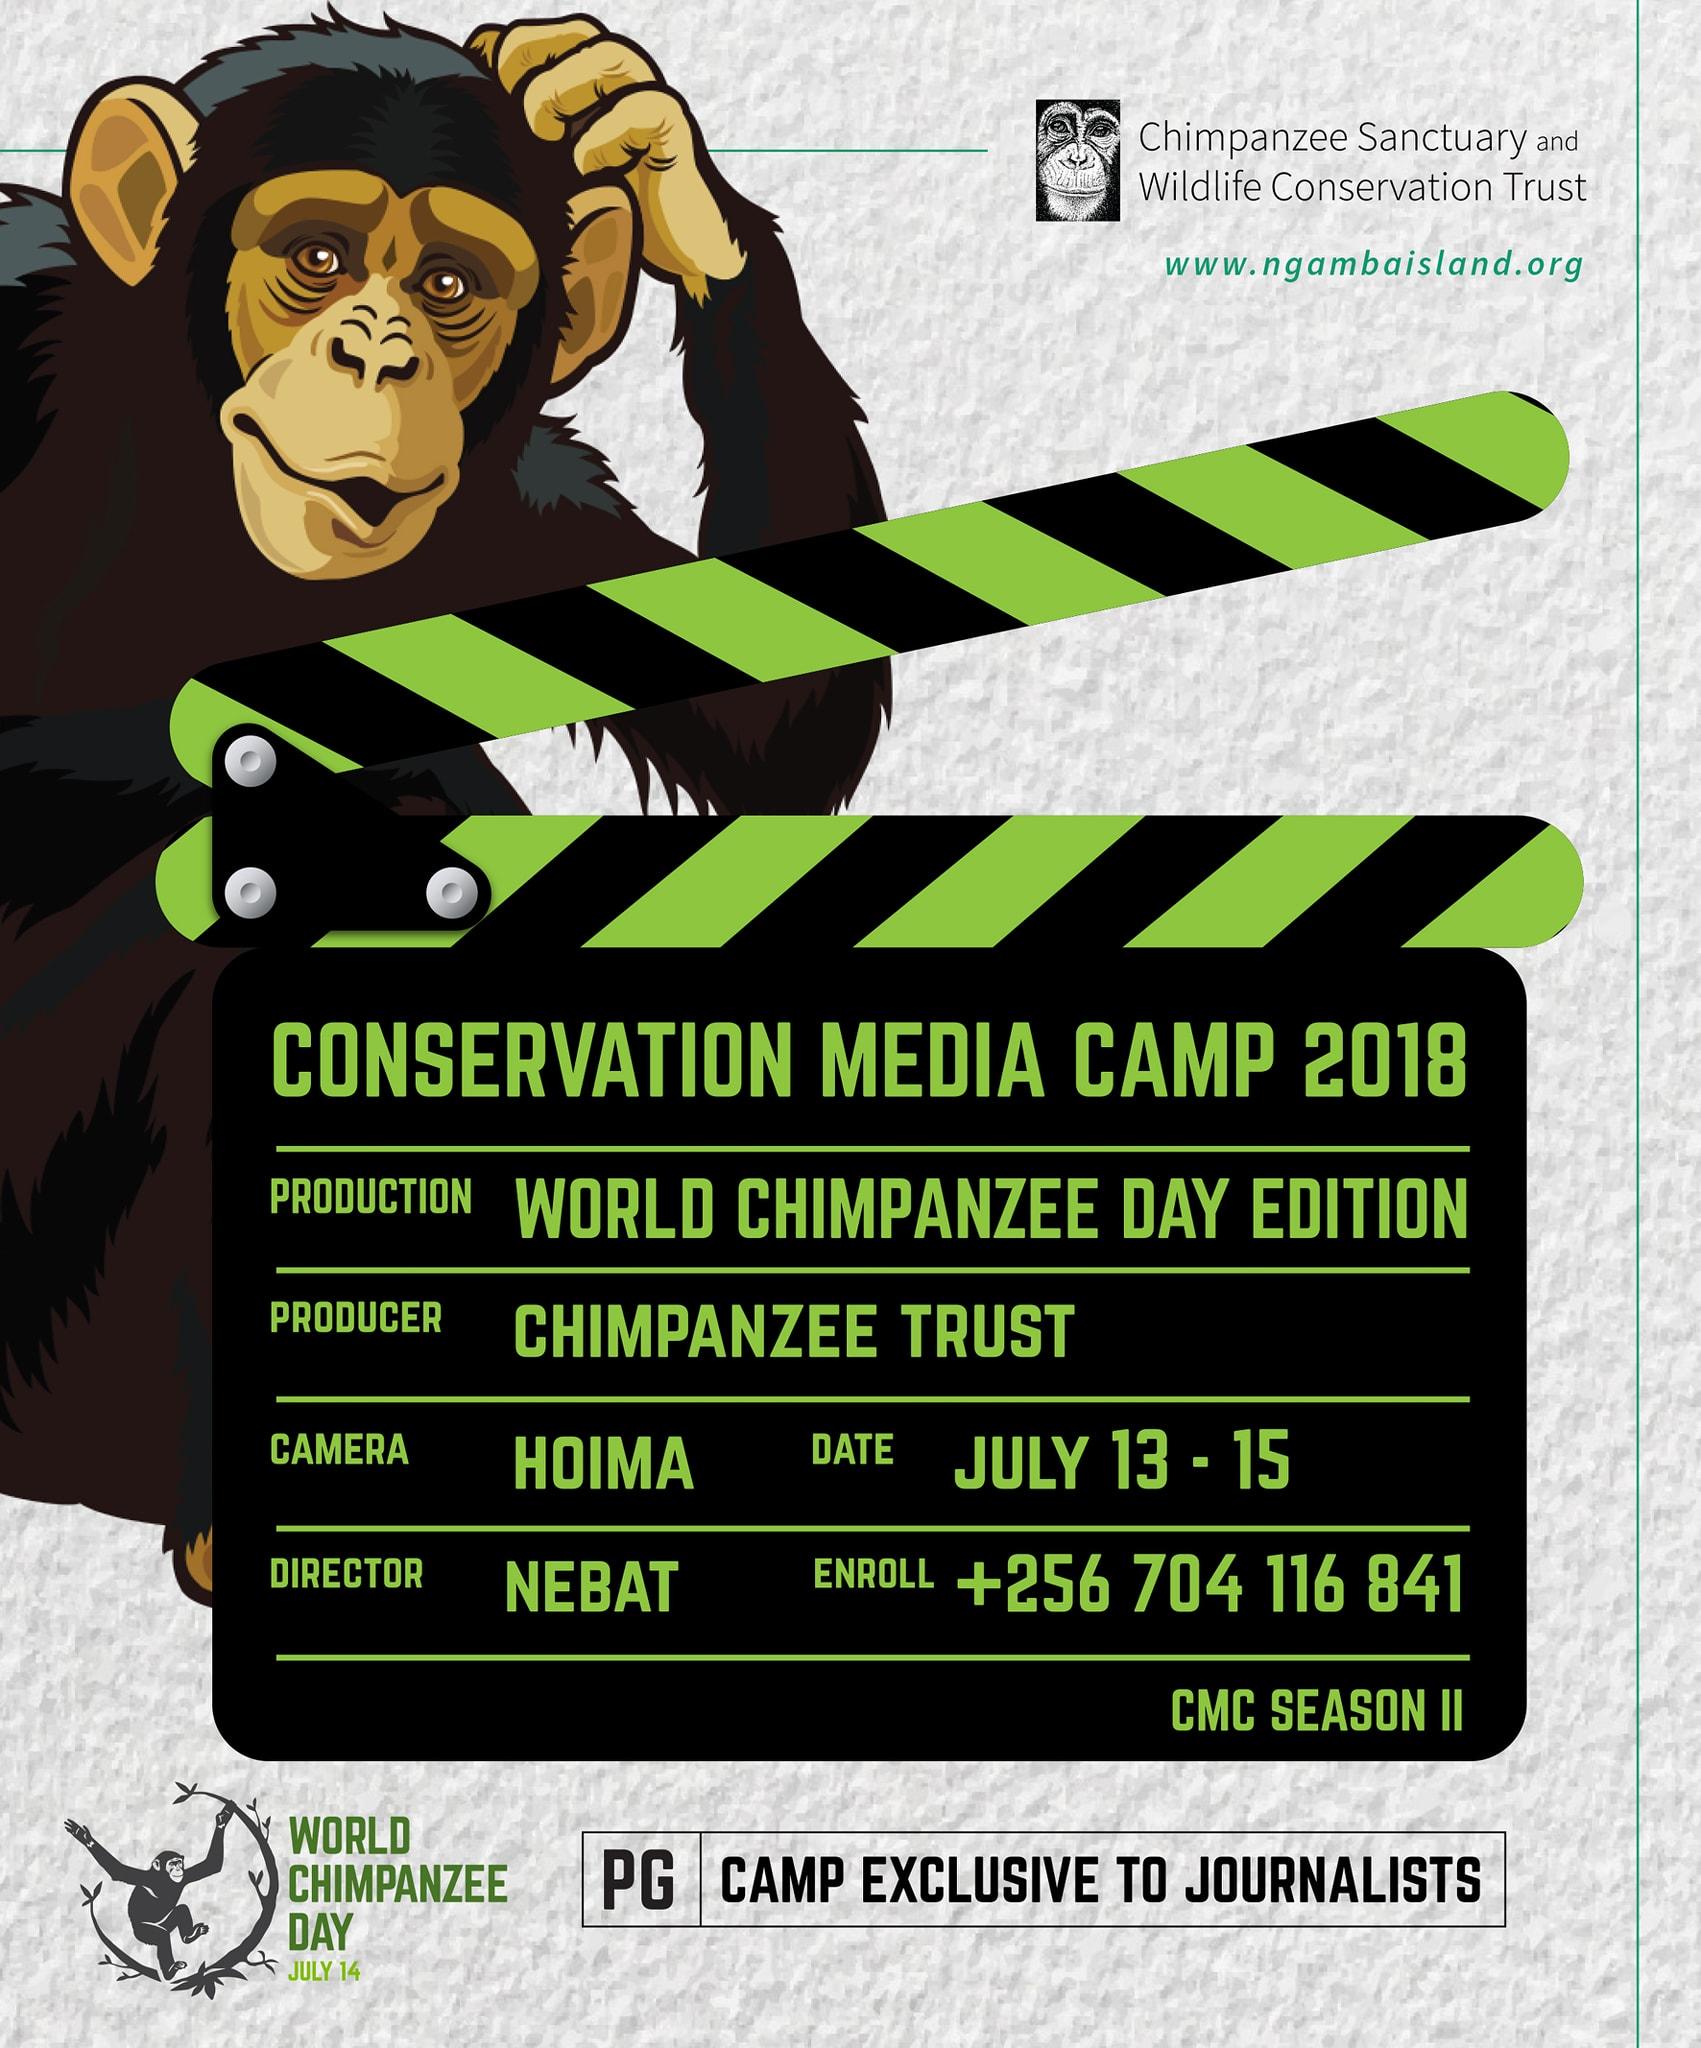 CONSERVATION MEDIA CAMP